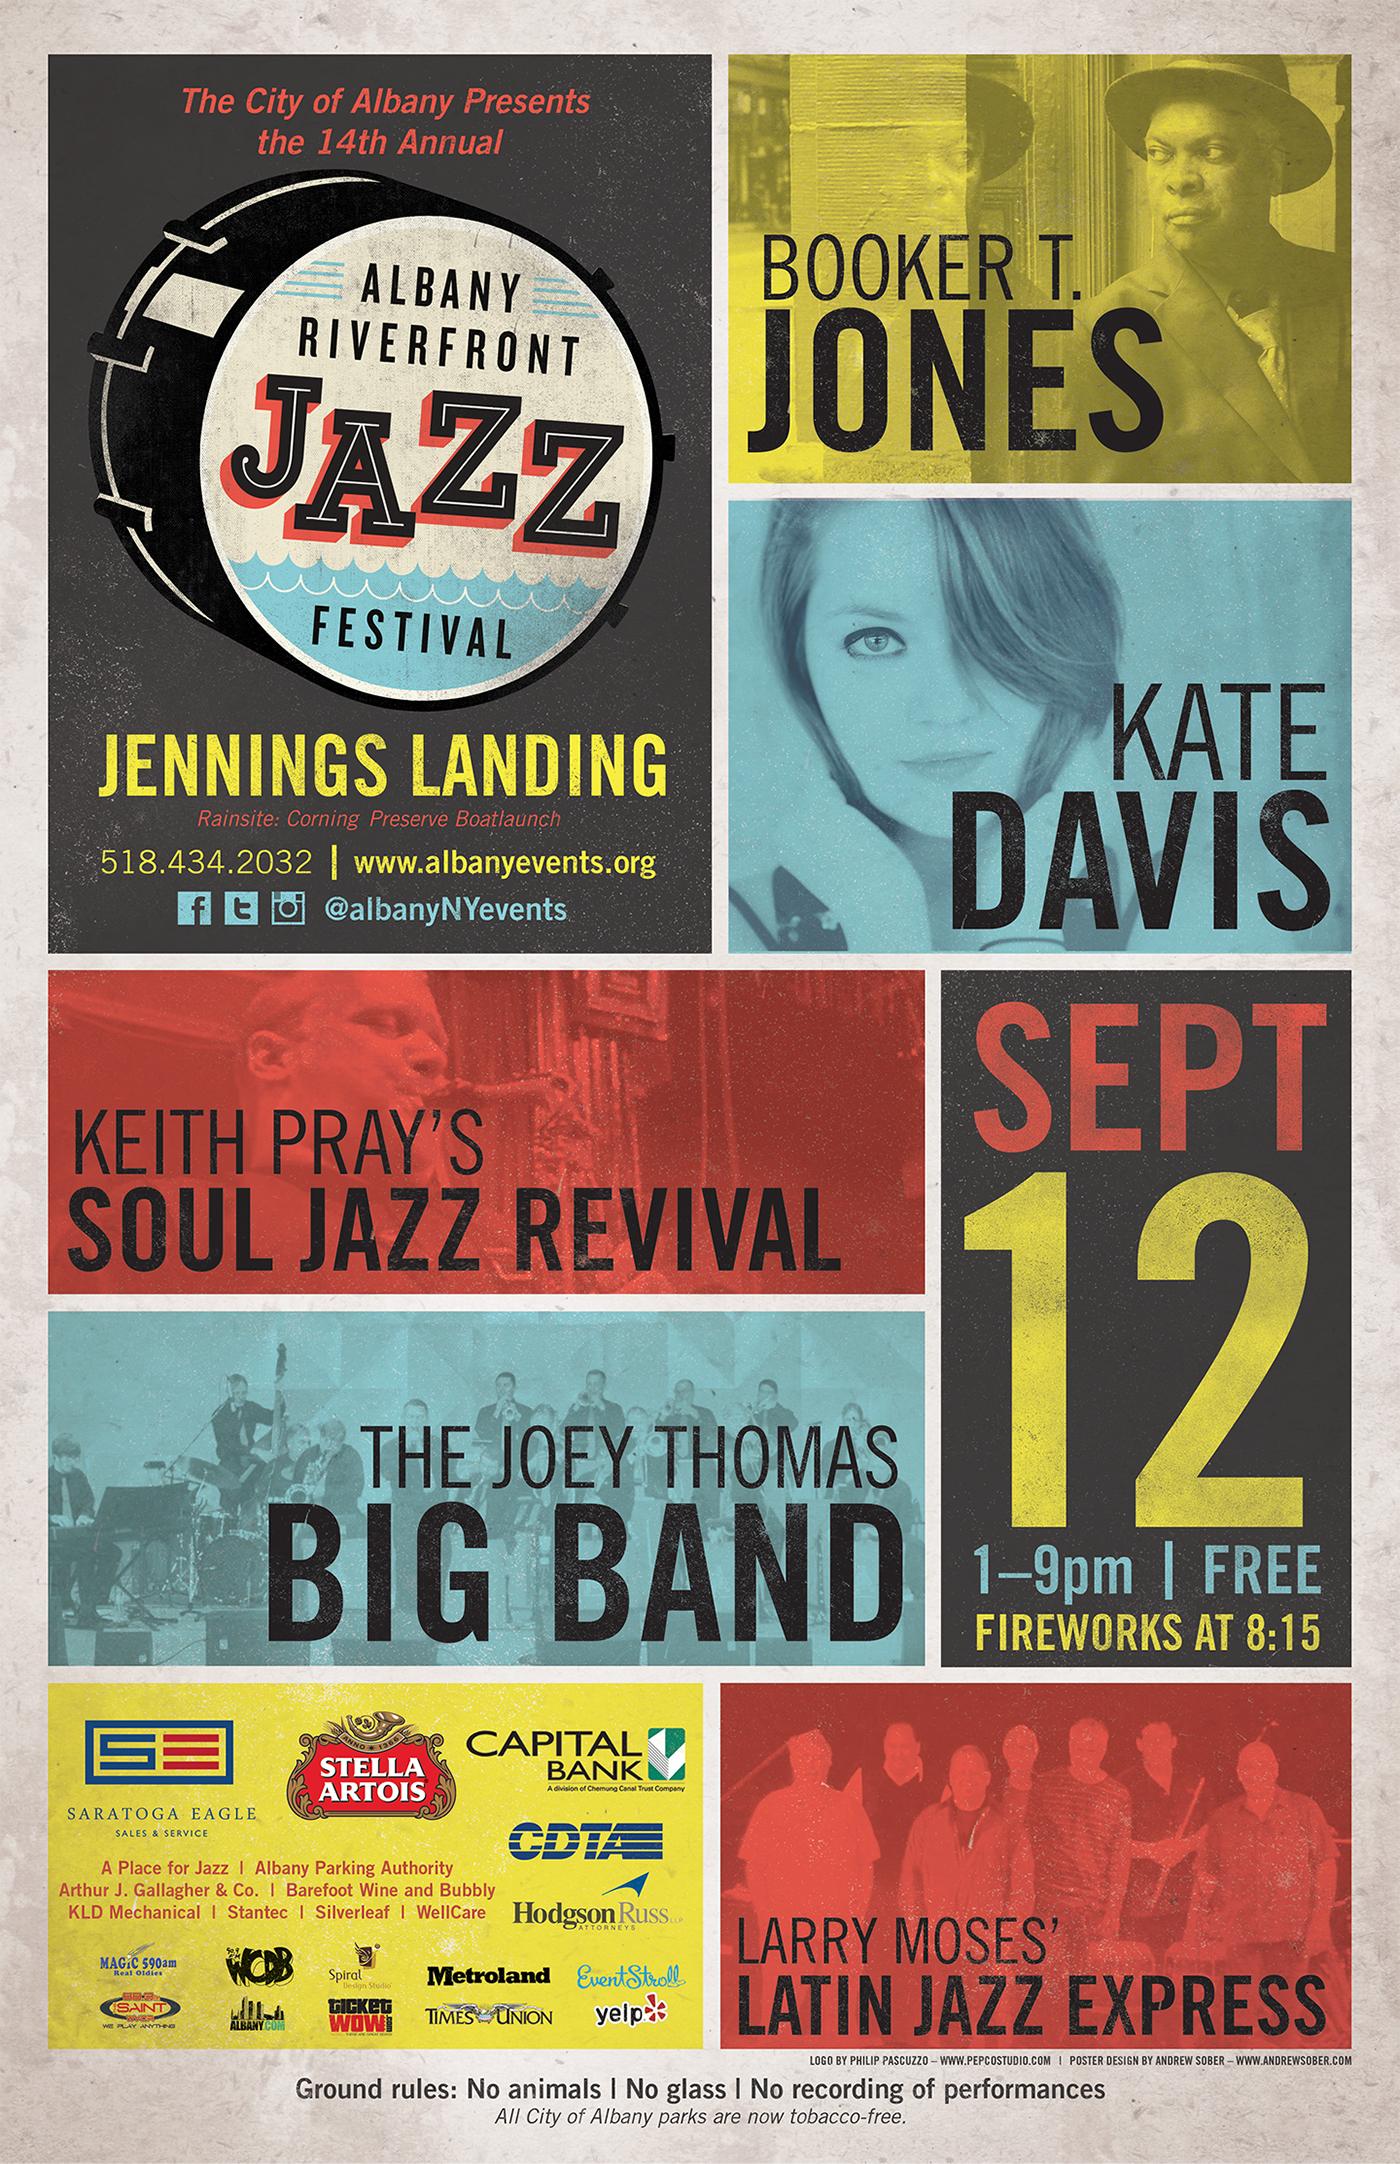 poster,jazz,festival,riverfront,Albany,New York,Music Fesitval